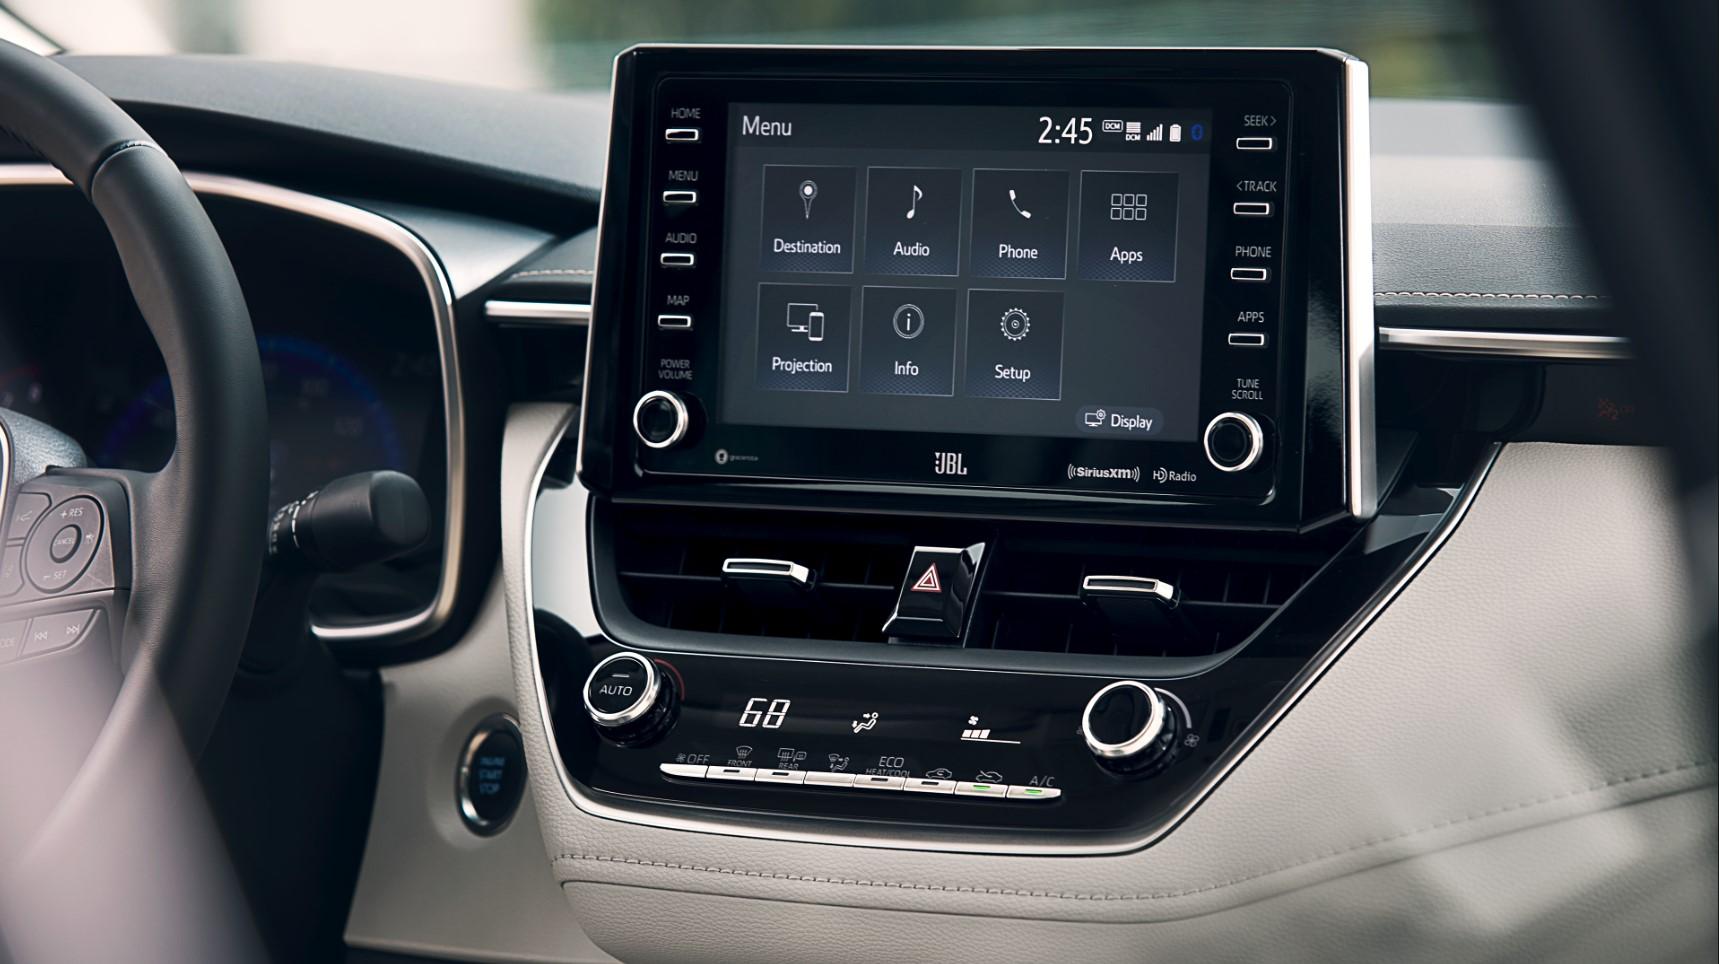 2020 Corolla Infotainment System